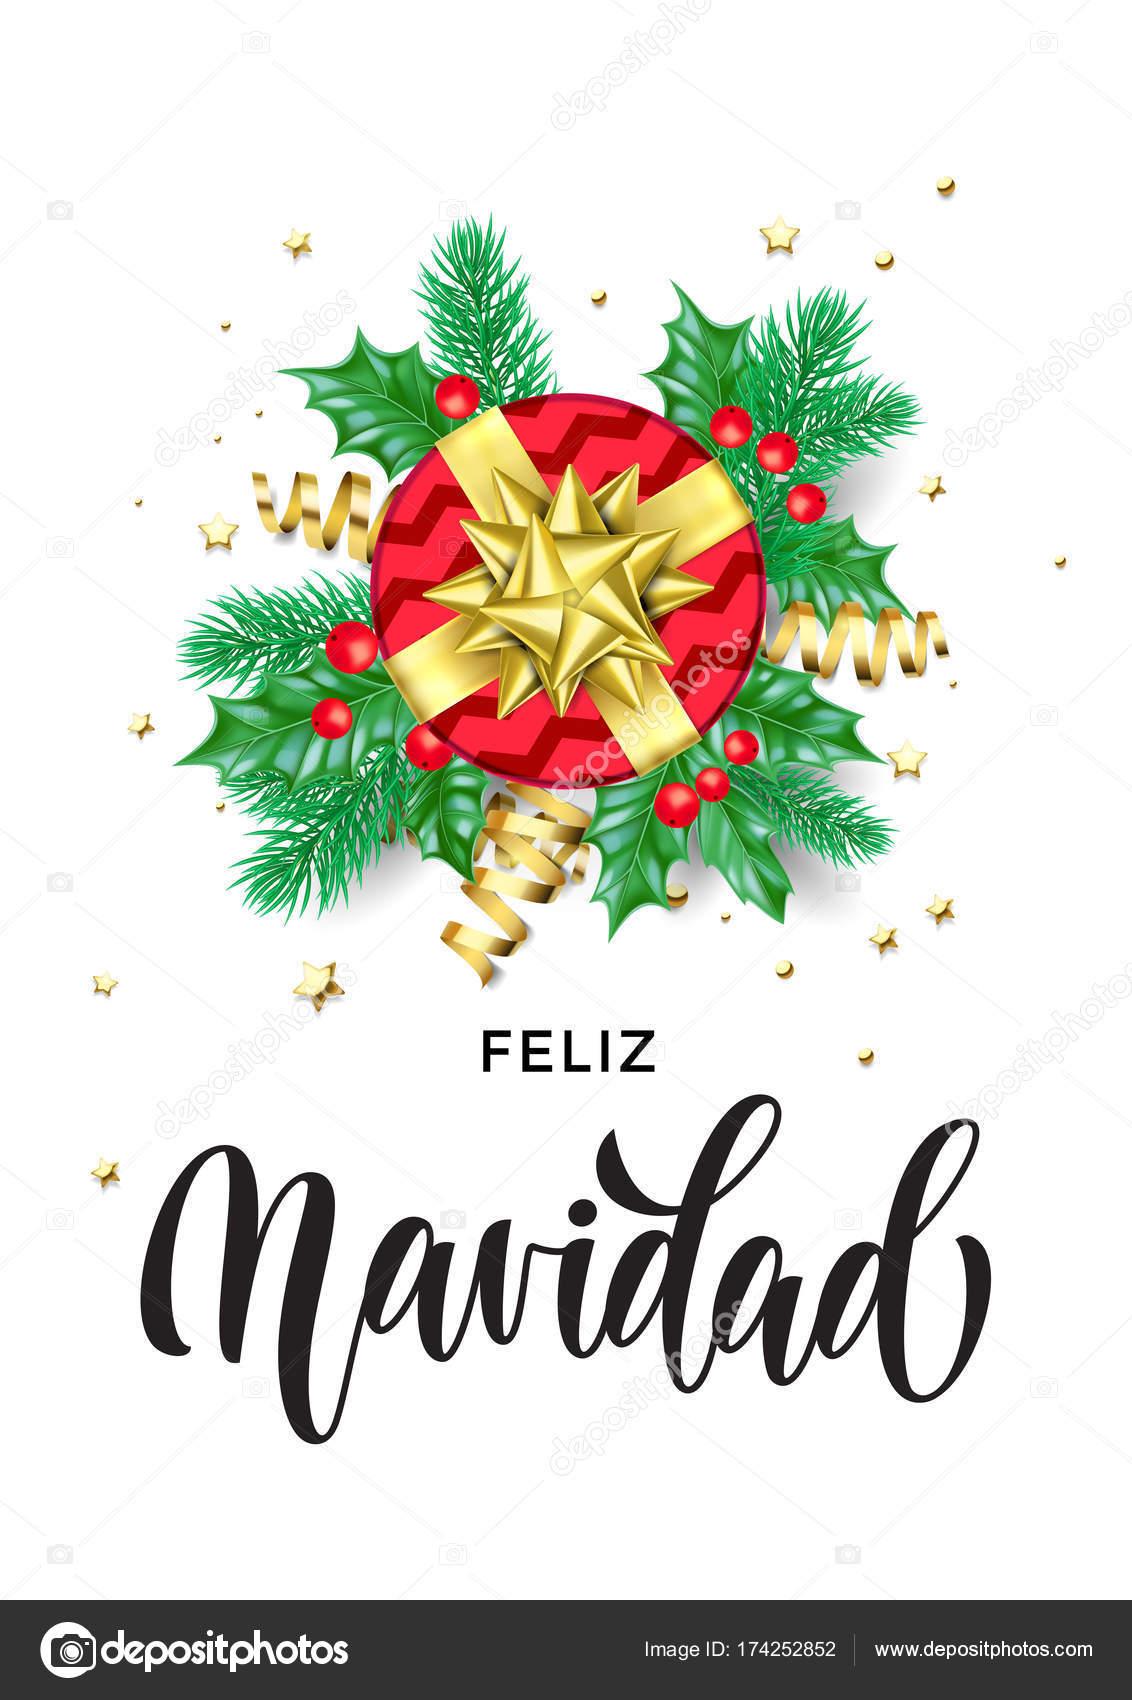 Merry Christmas Spanish Feliz Navidad Holiday Hand Drawn